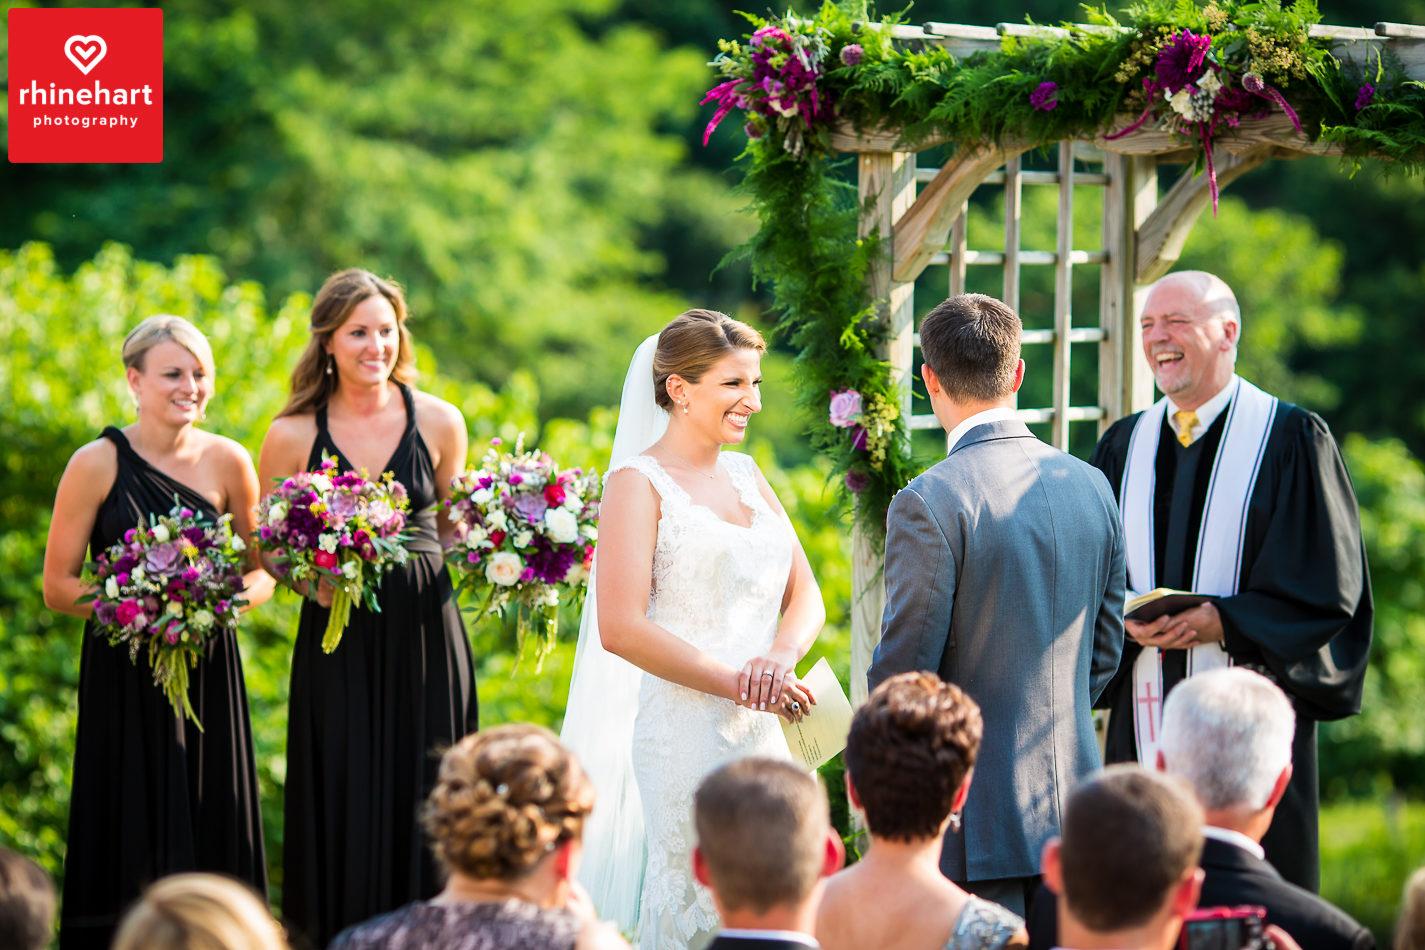 glasbern-inn-wedding-photographer-224